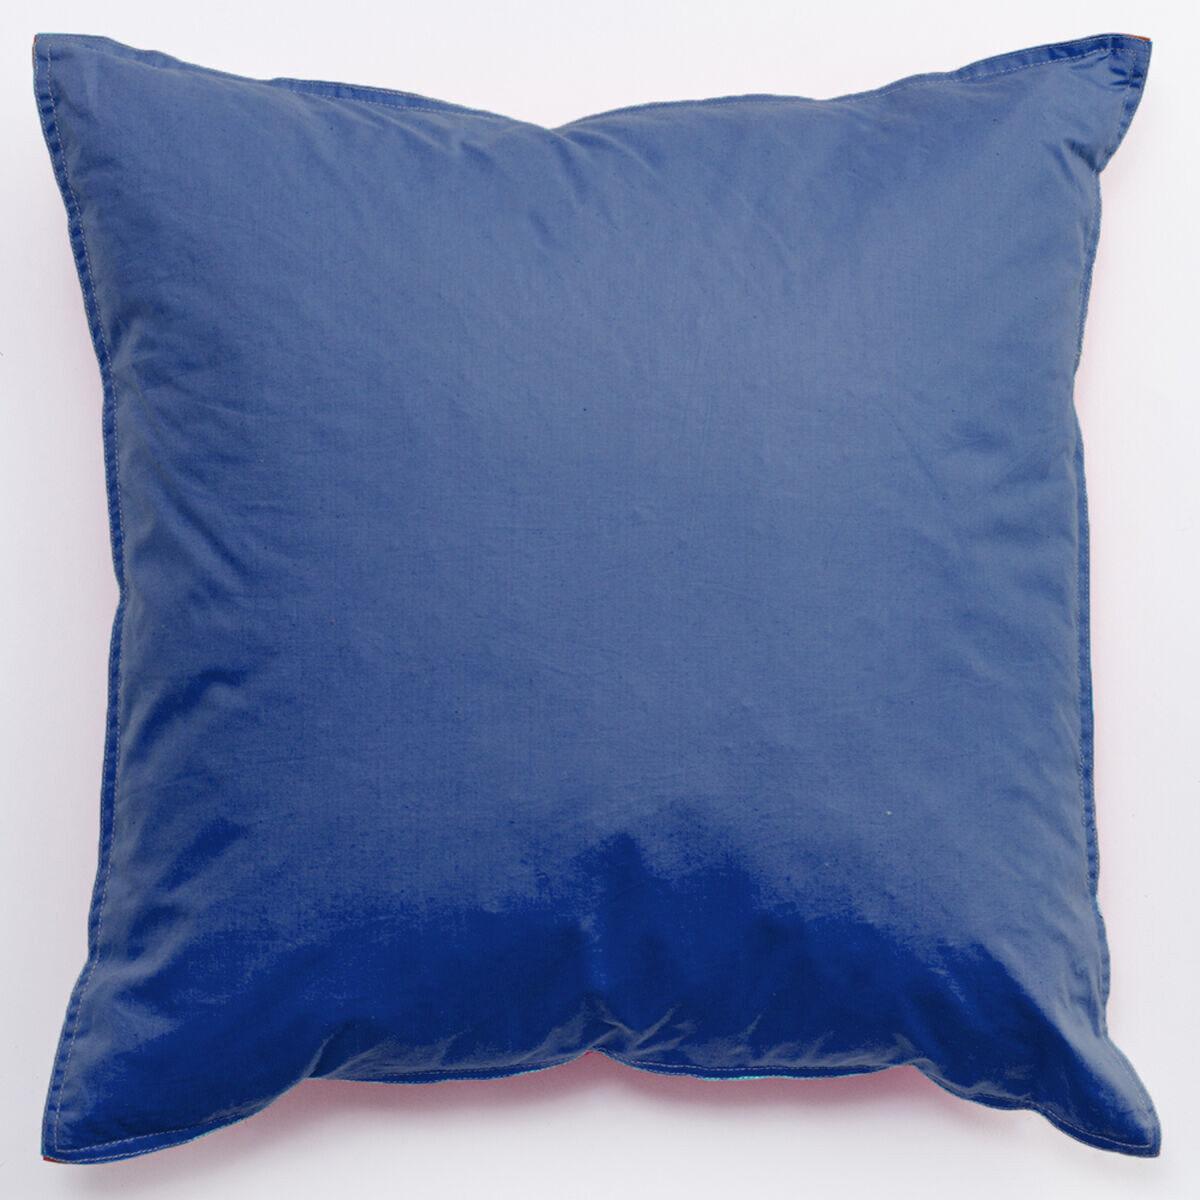 Cojín Bicolor Pluma Casanova Limited Edition Blue - Mint 40 x 40 cm